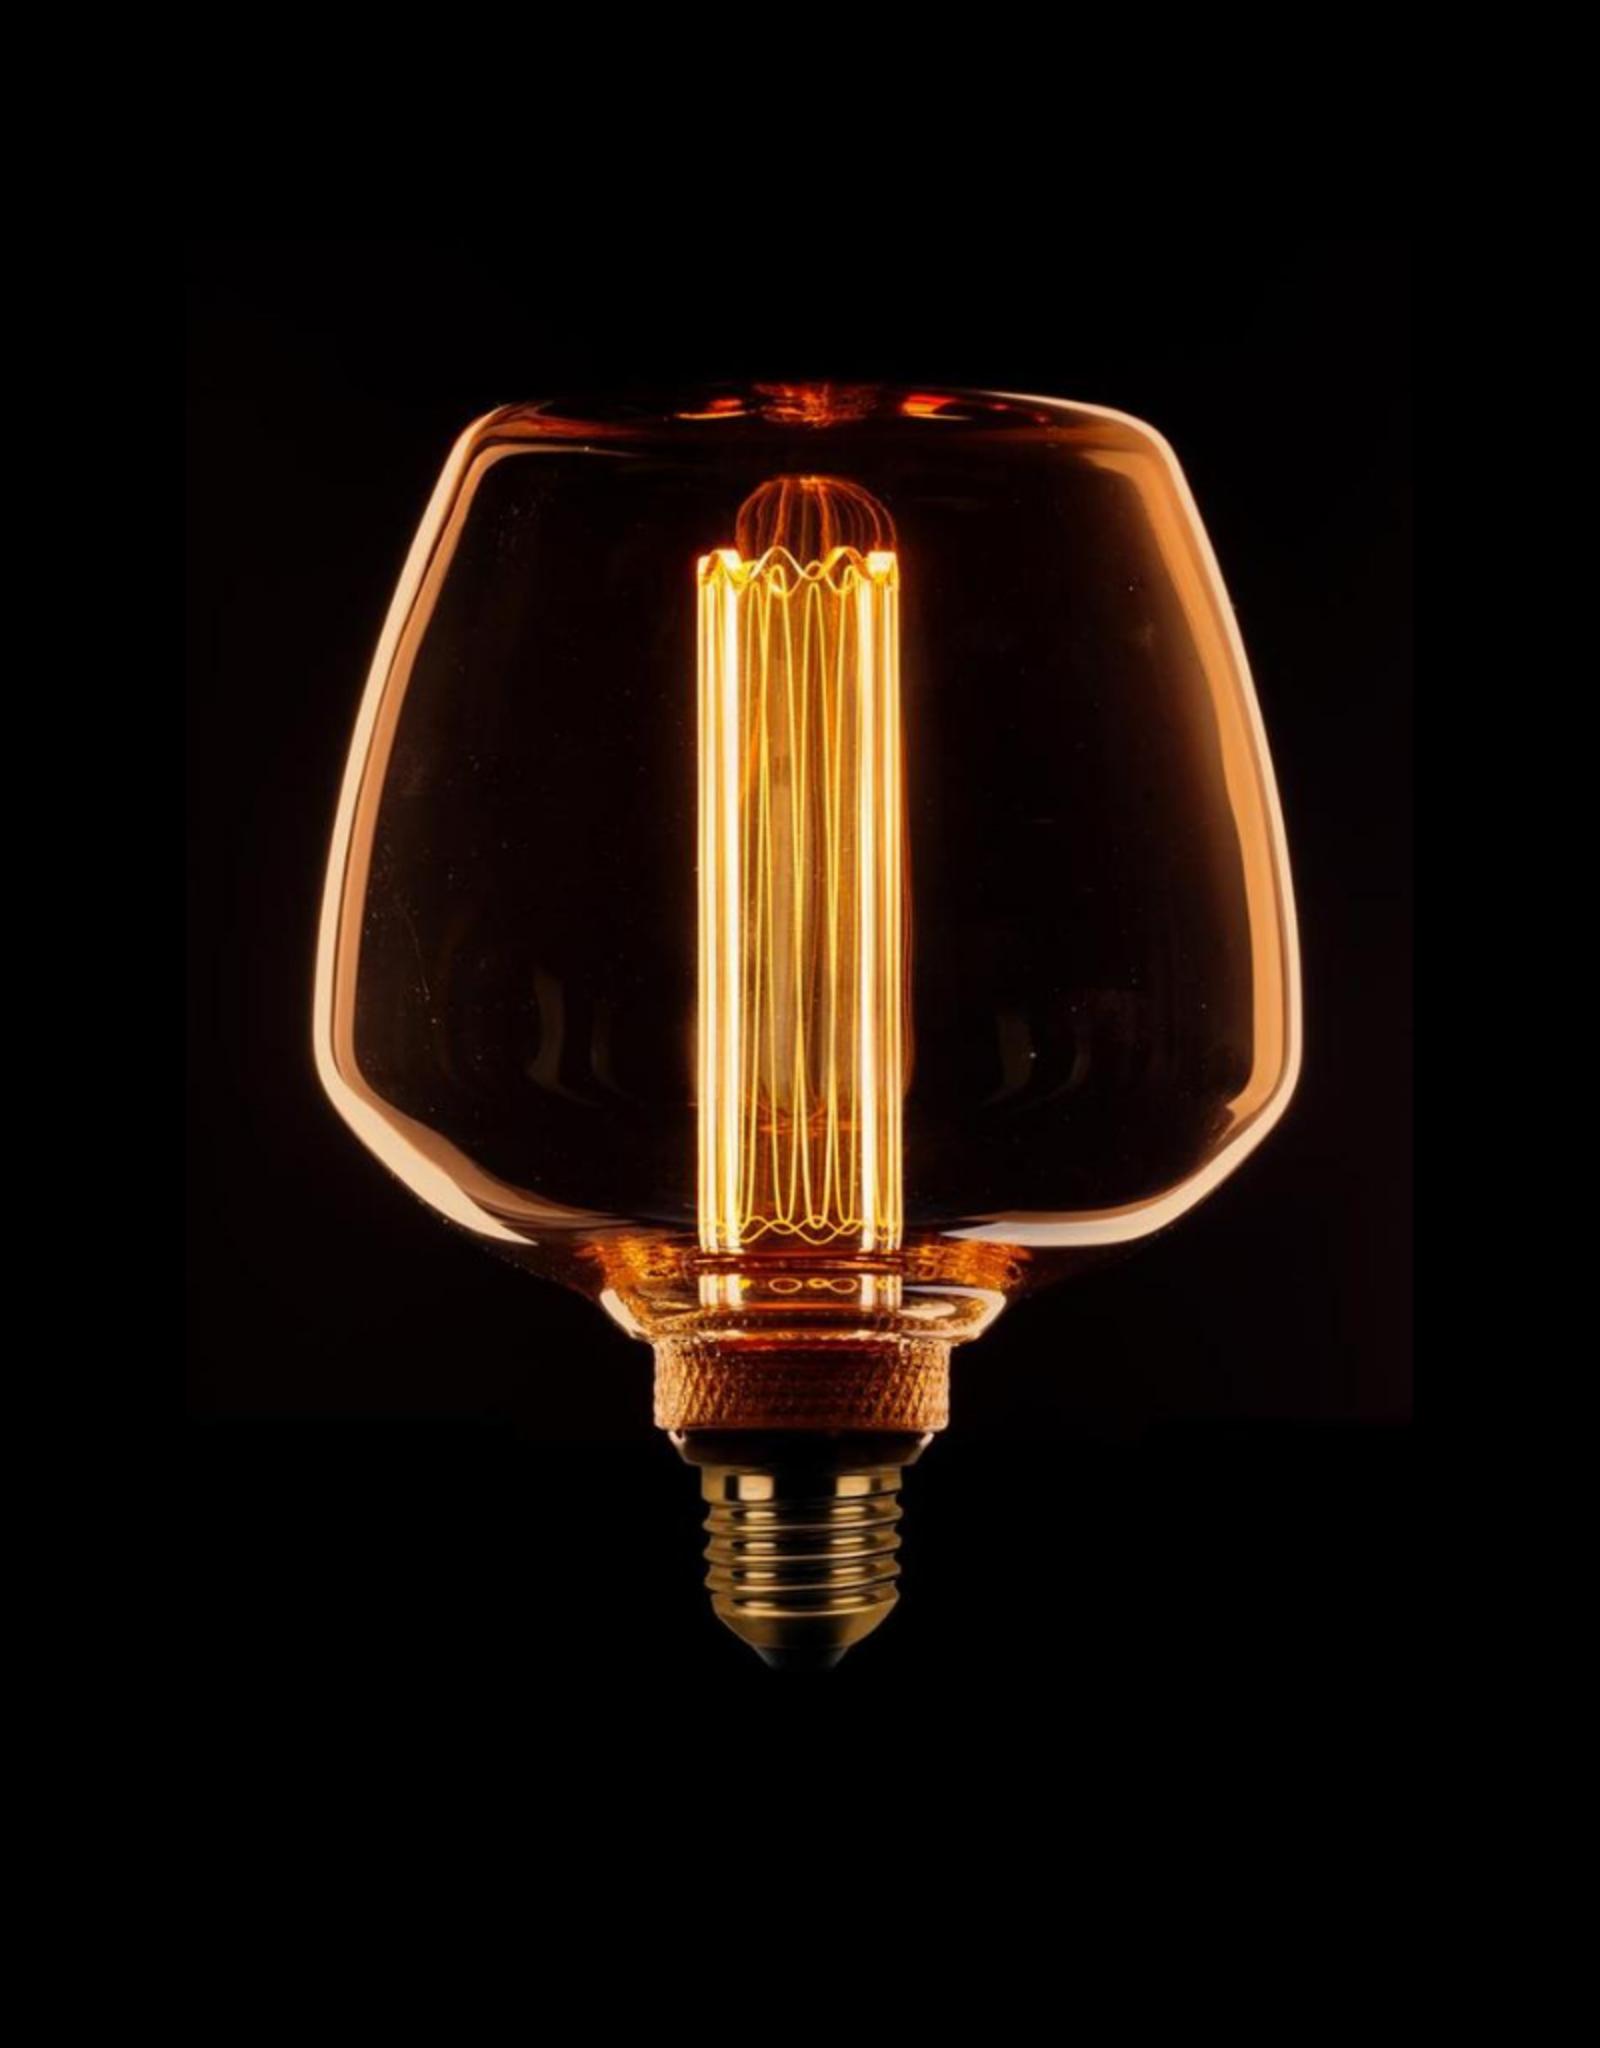 LED Lamp Trapezium Kooldraad - 3 stappen dimbaar - Amber/Goud E27